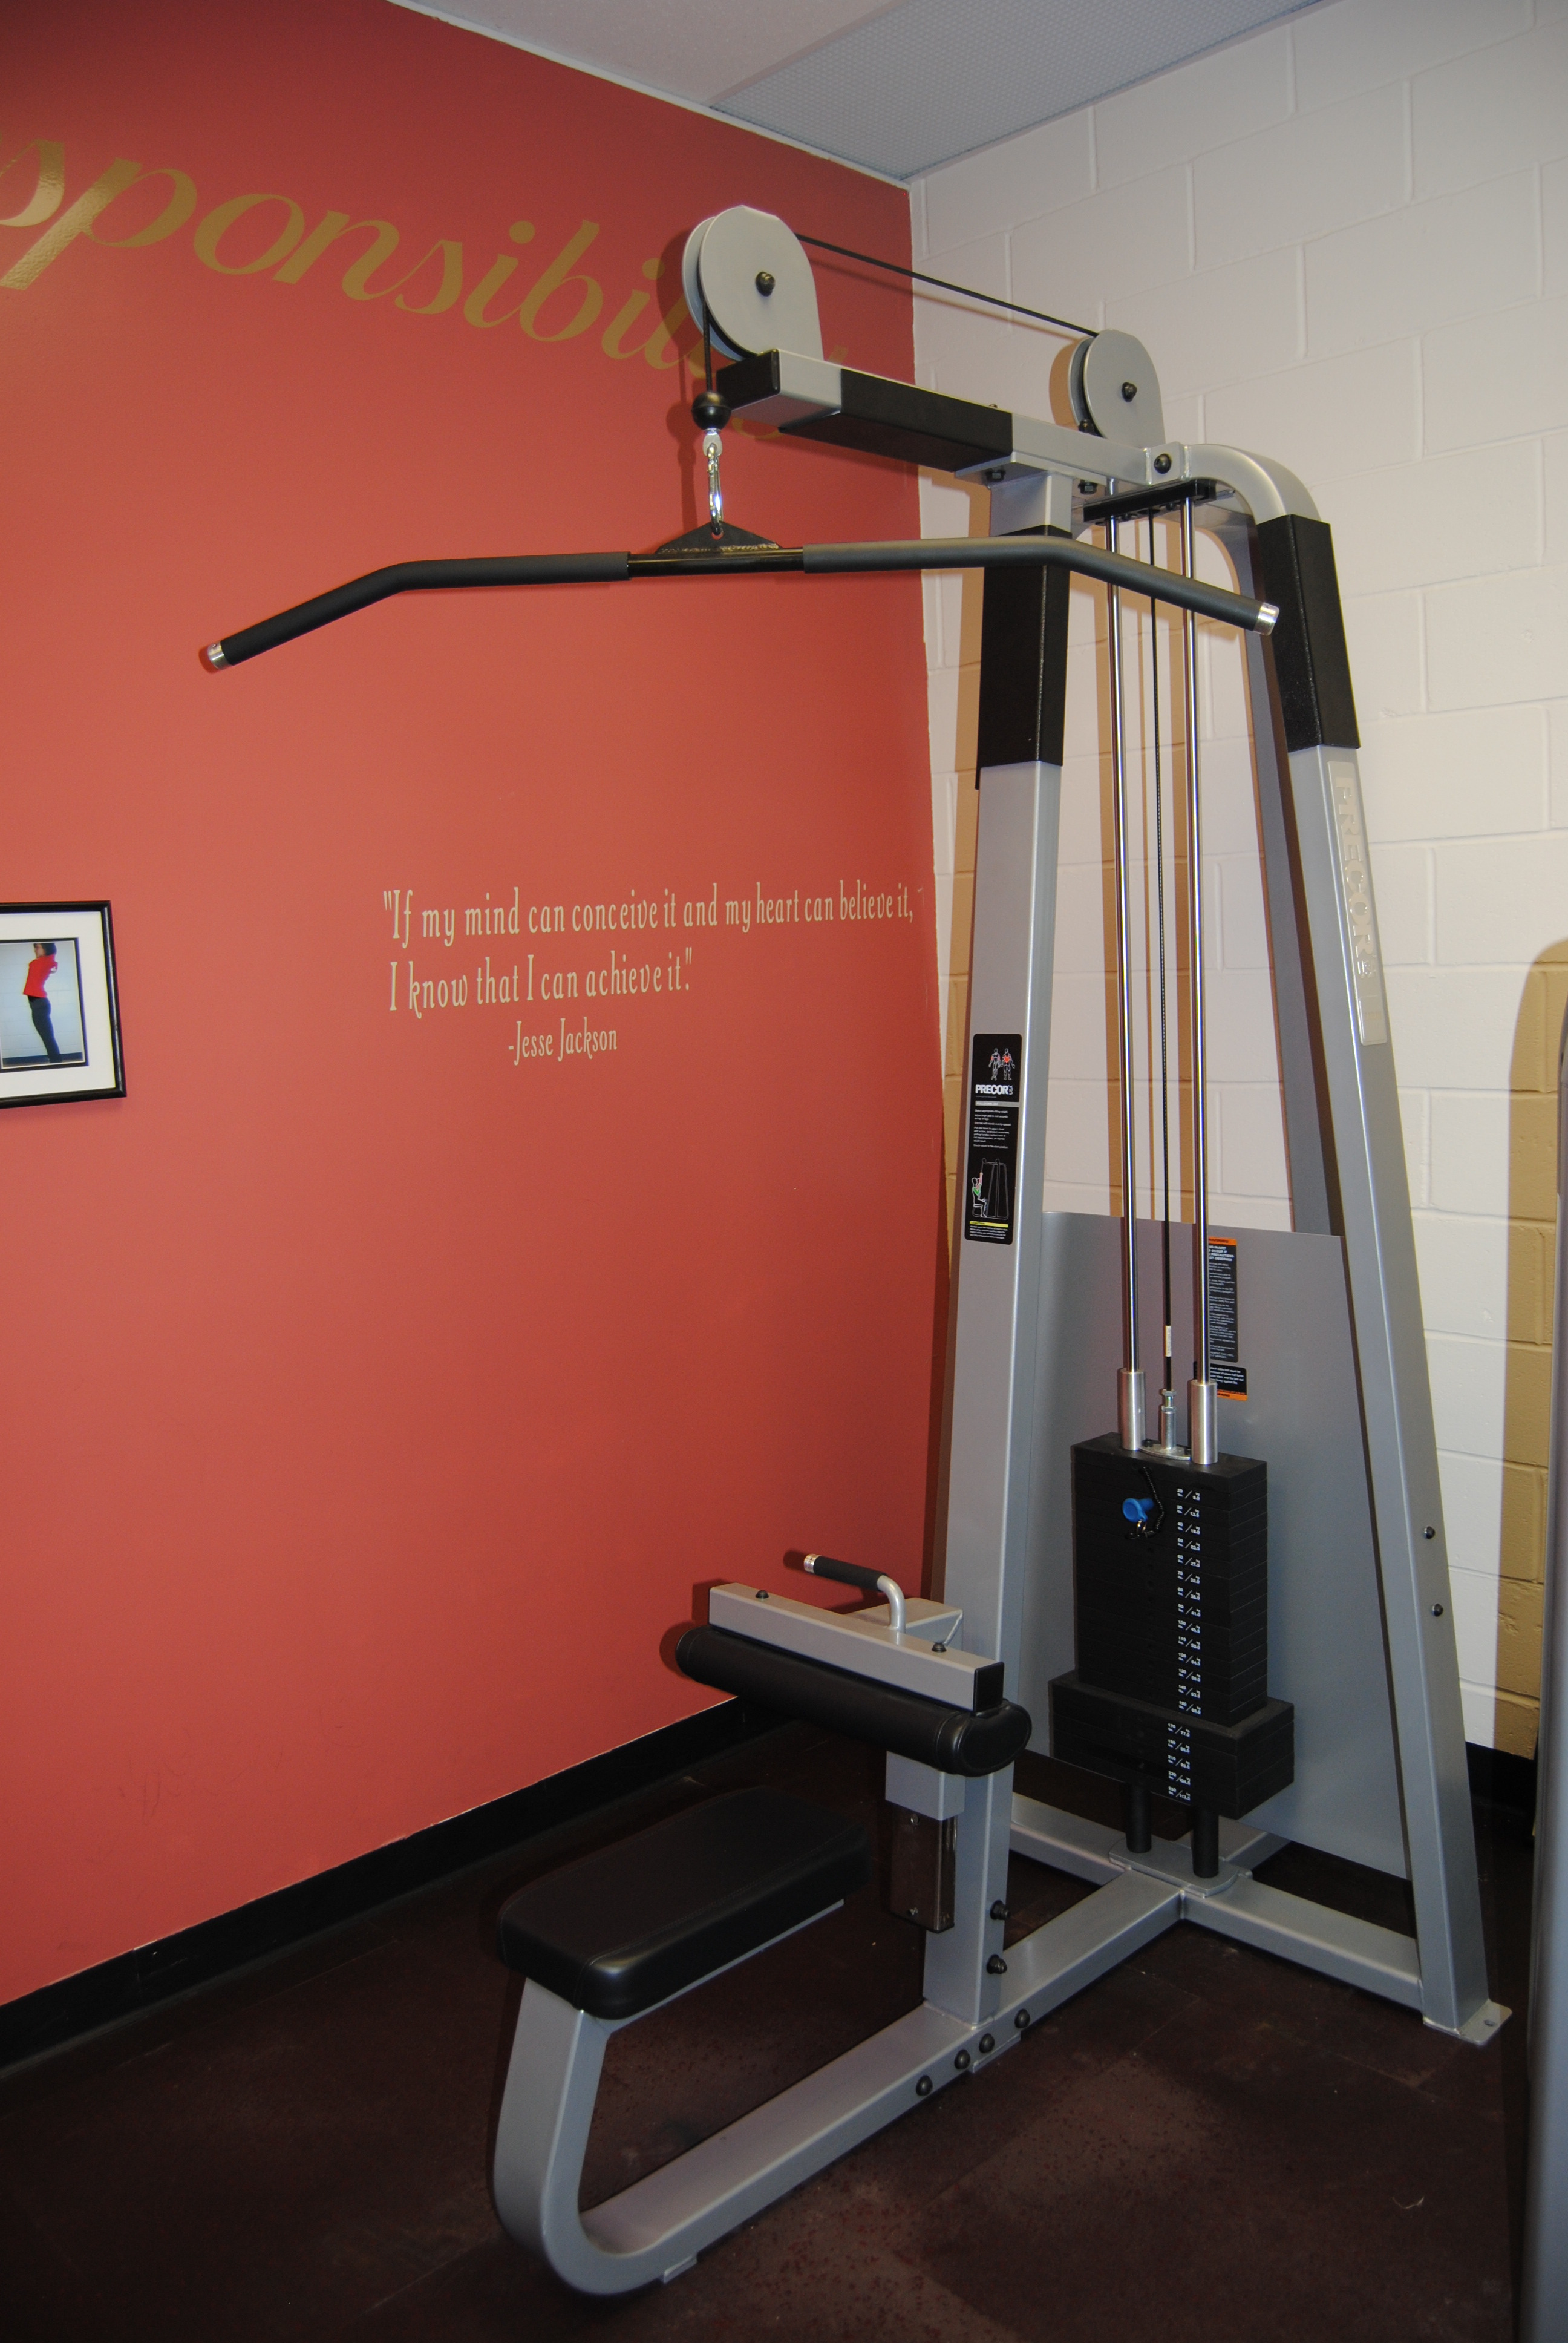 39fe61fbc4b469c2b916_Wellness_Coaching_Equipment_2014_005.jpg